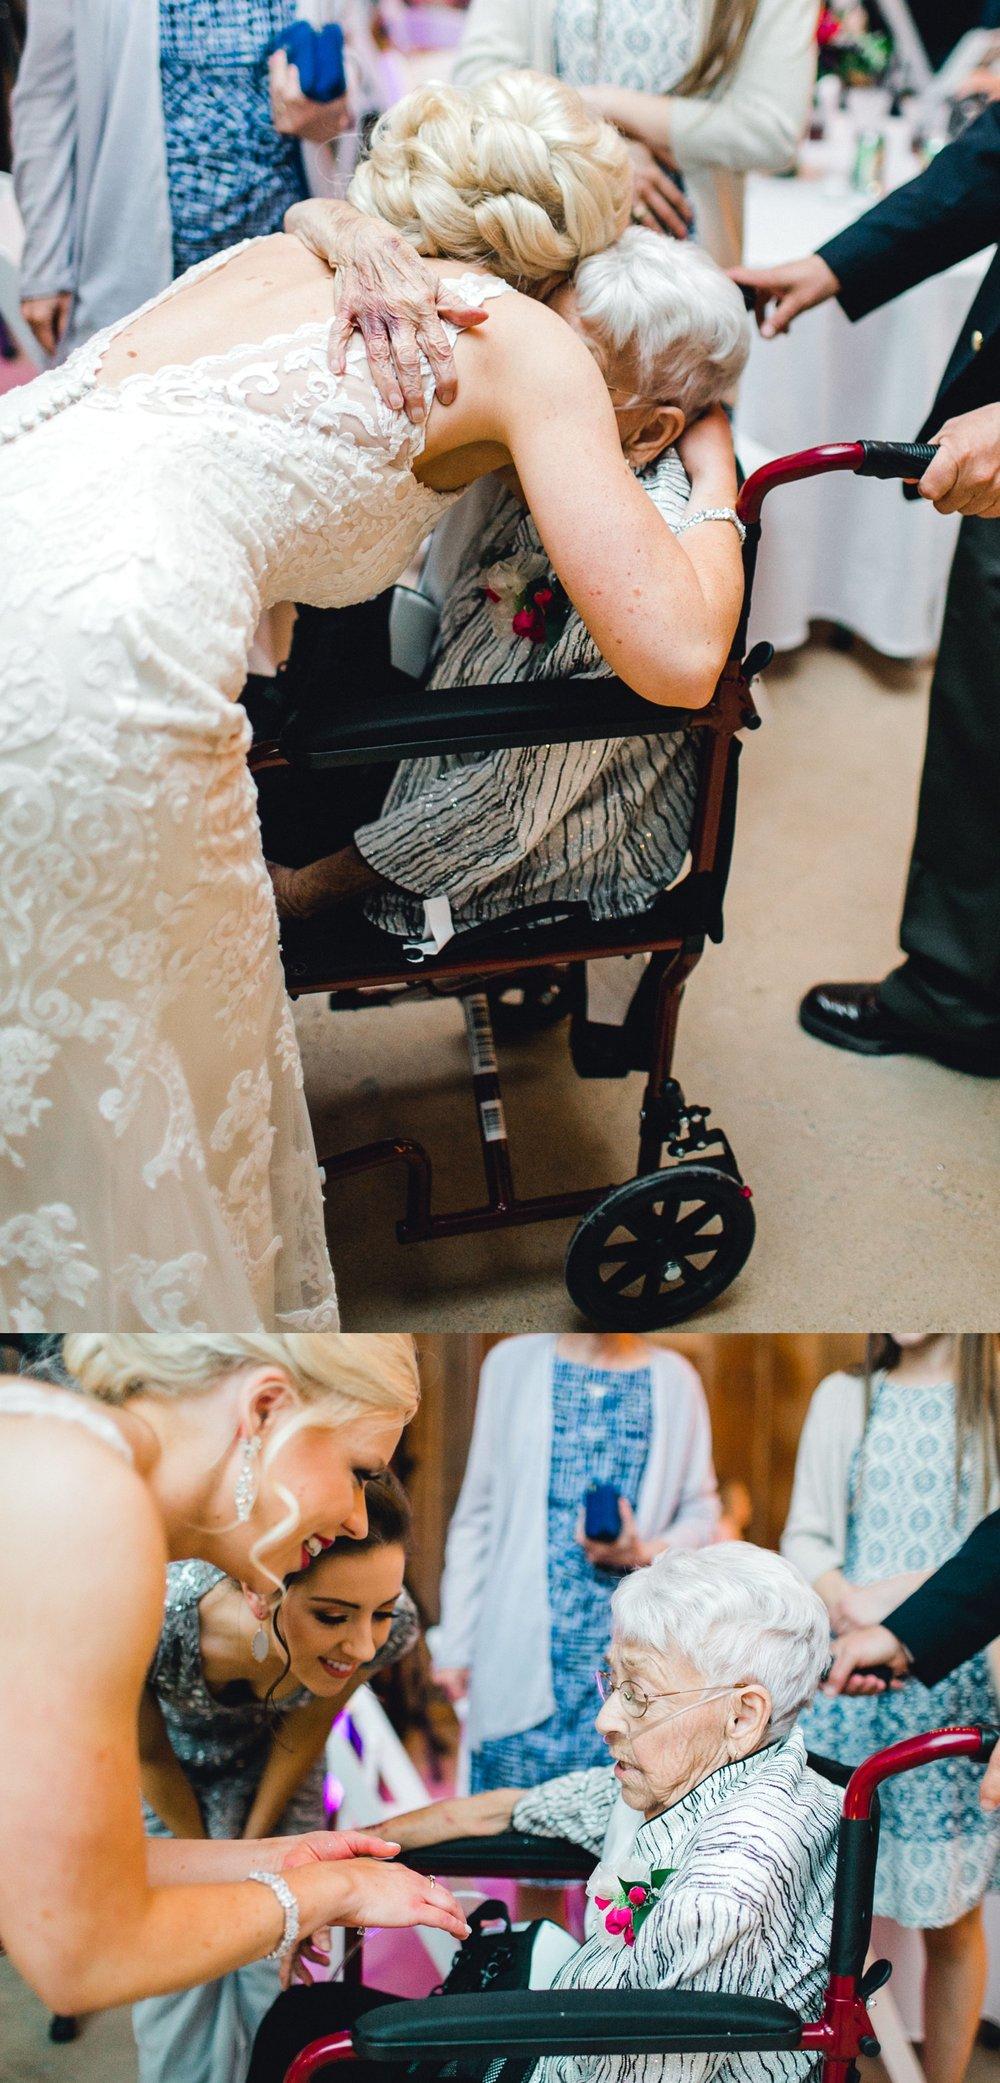 Jenna-and-garrett-Everett-kitalou-gin-lubbock-wedding-dayspring-designs-lubbock-wedding-photographer_0177.jpg